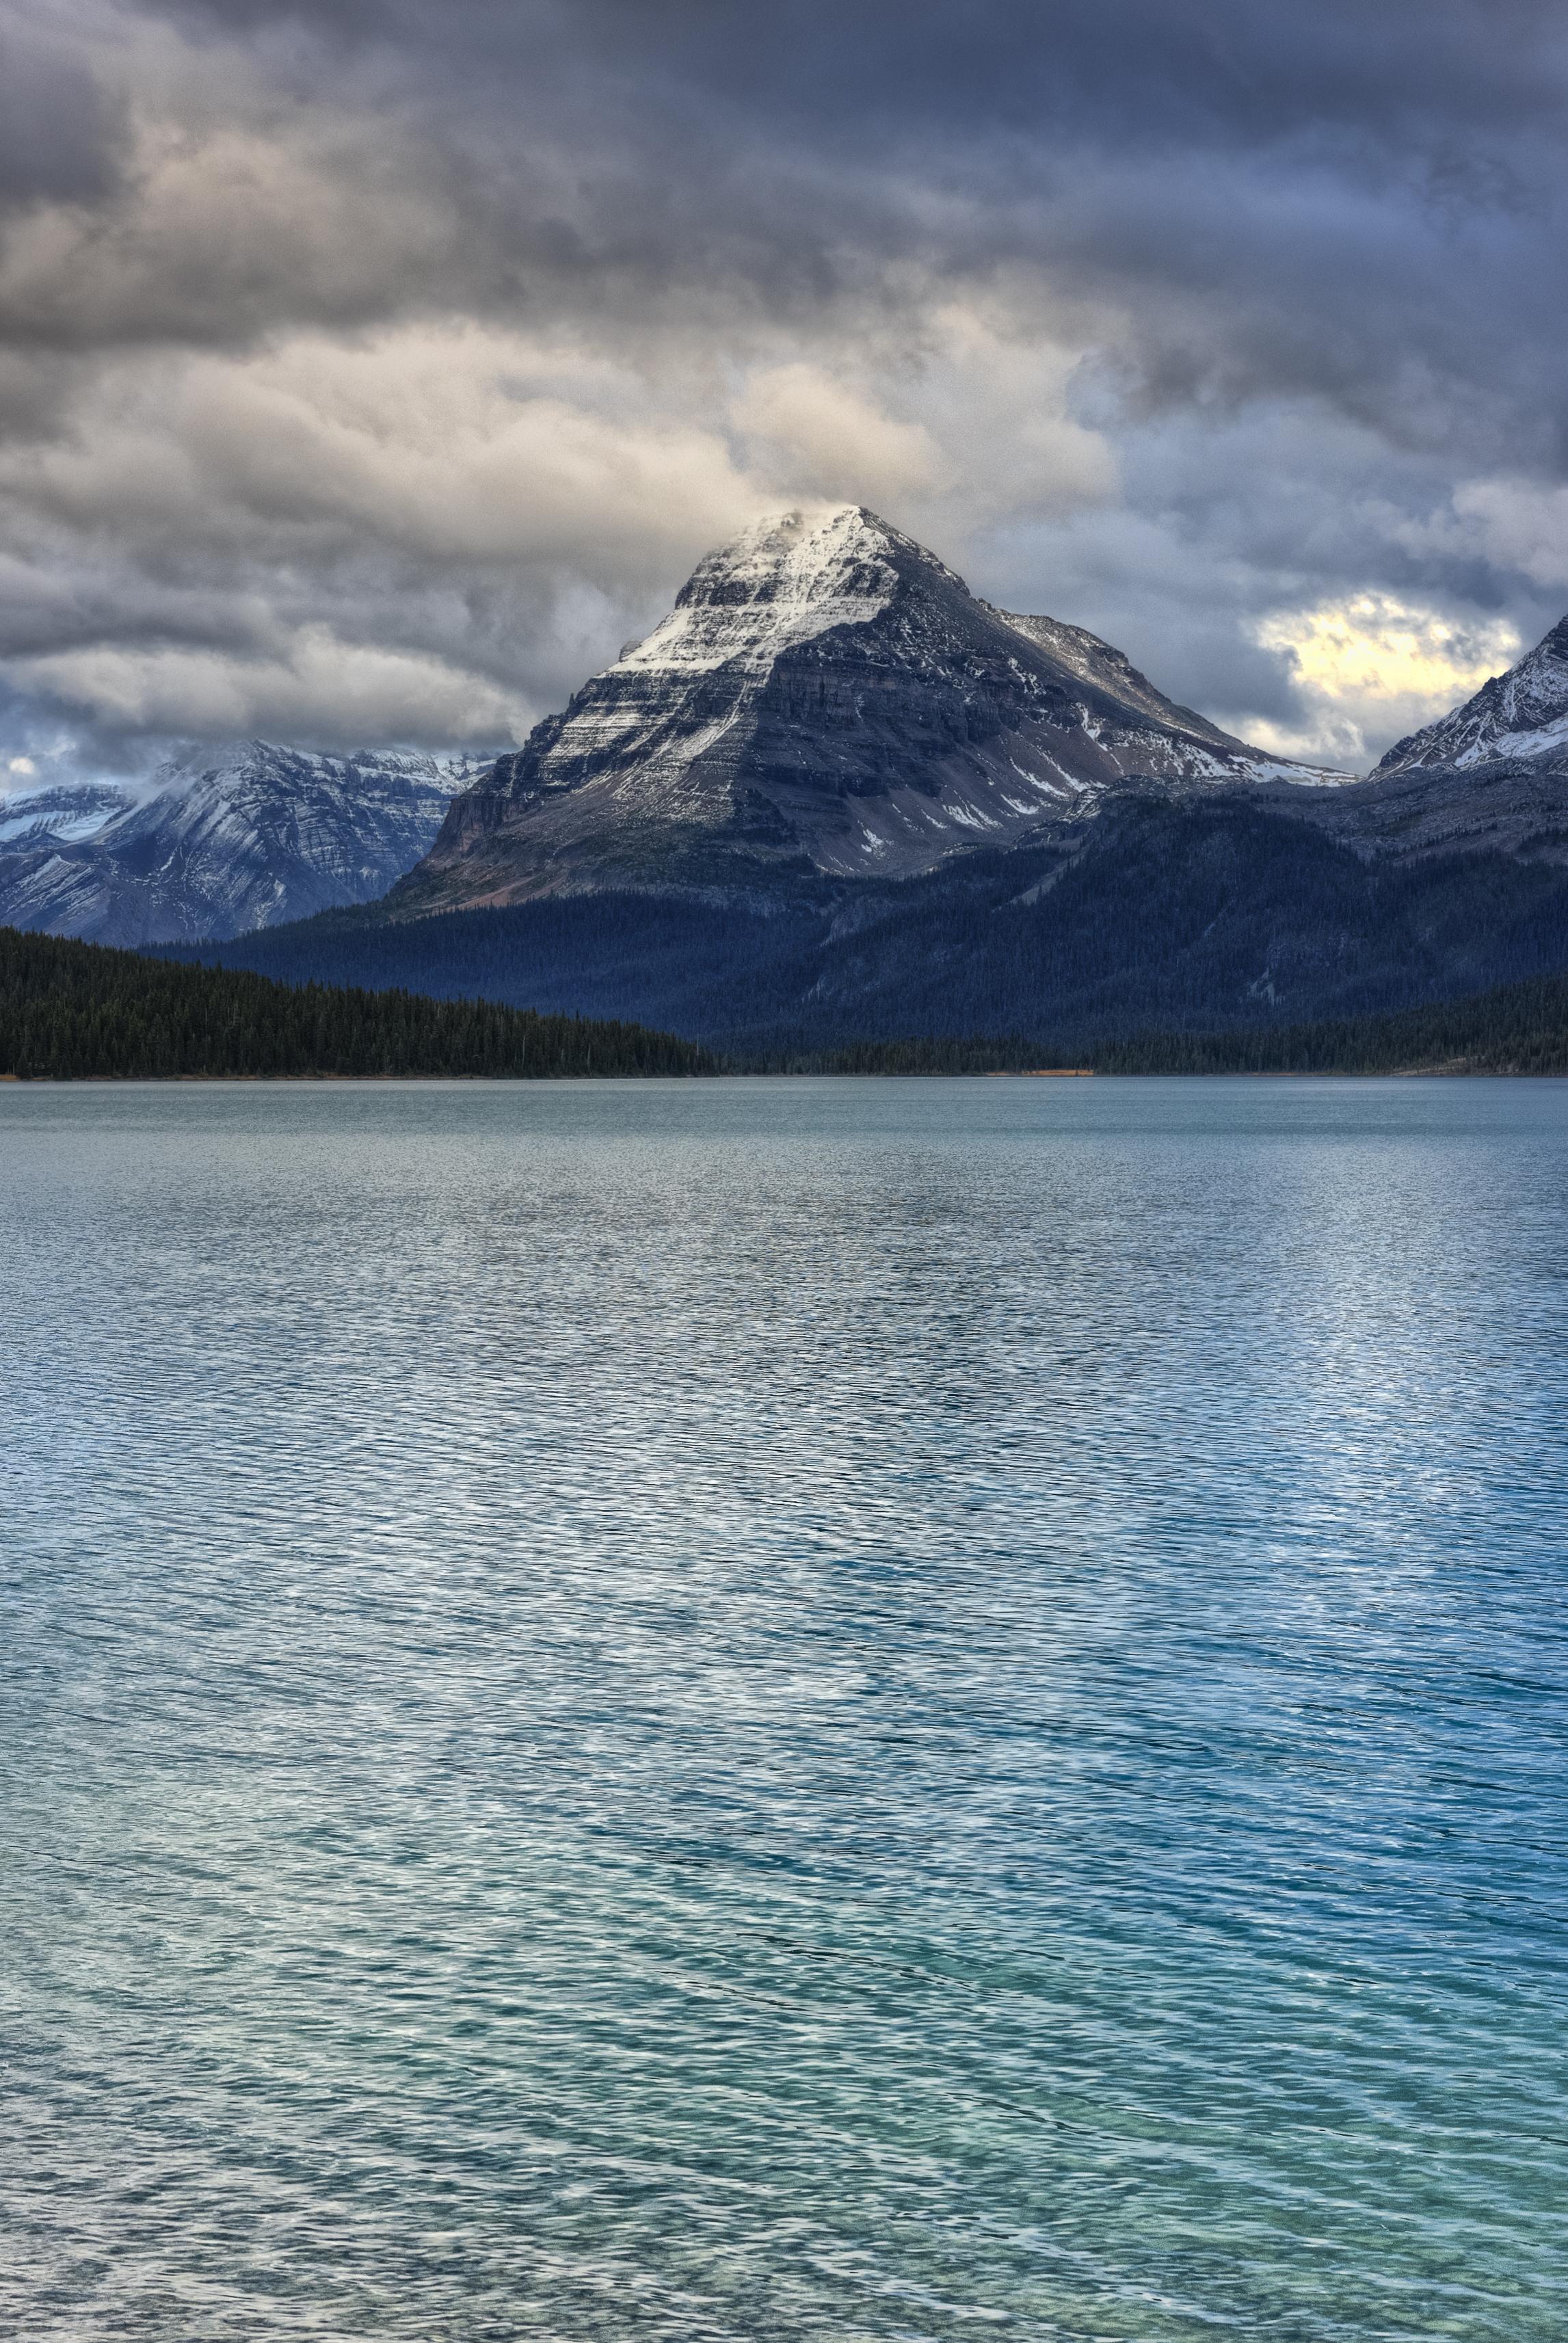 Bow Lake and Mountain, Alberta